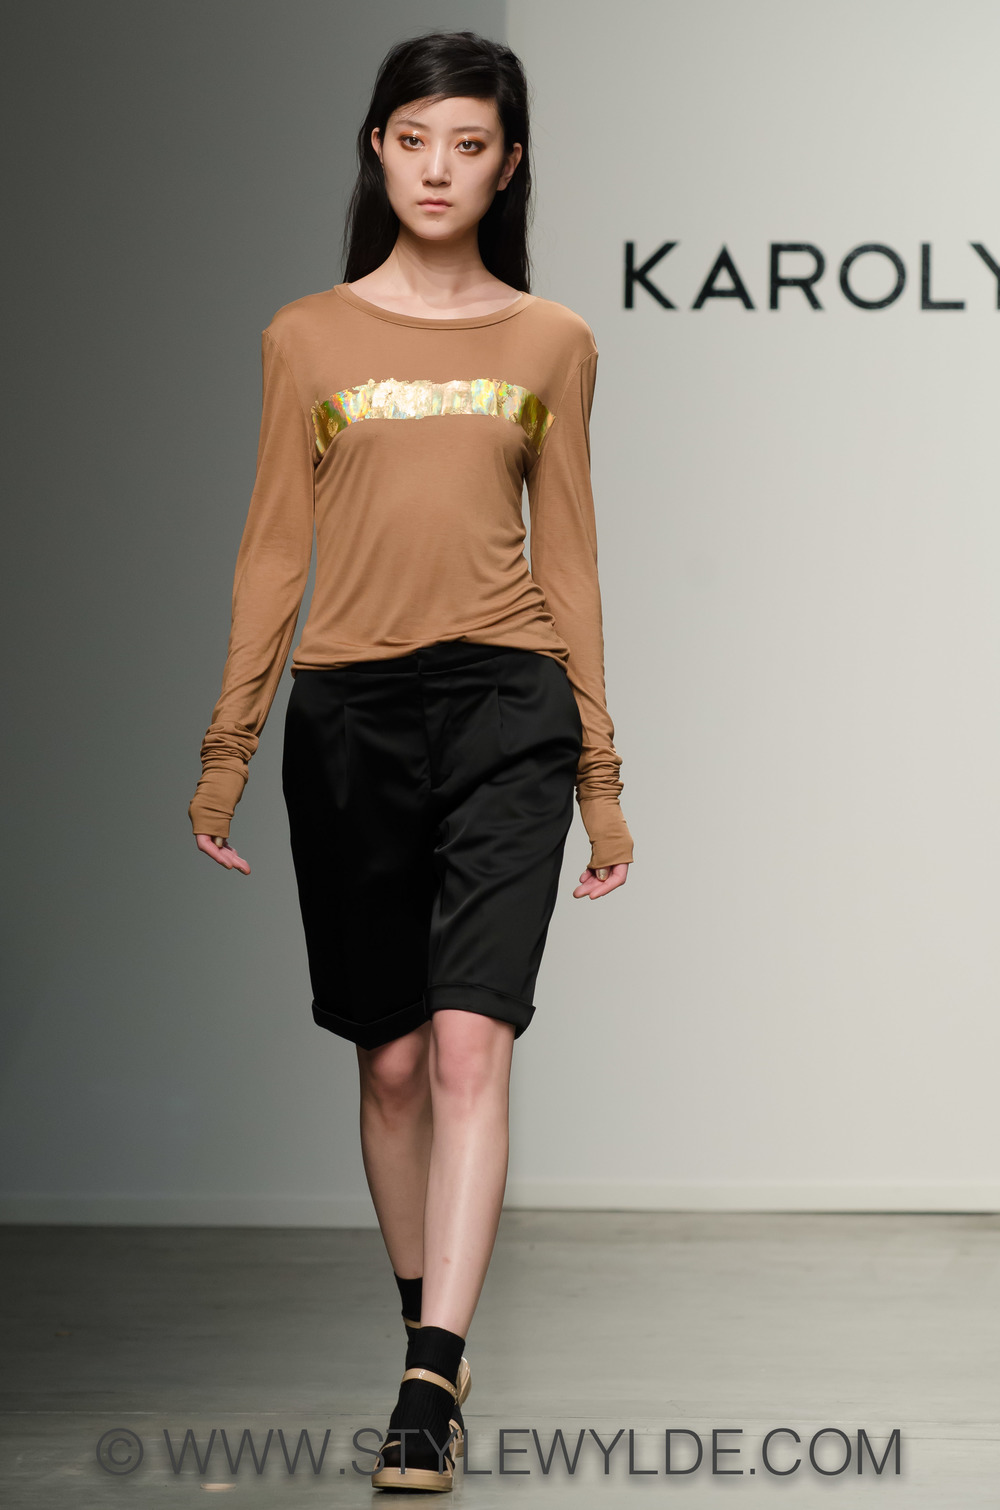 Stylewylde_KarolynPho_FOH_Bkstg_Story 10 of 26.jpg